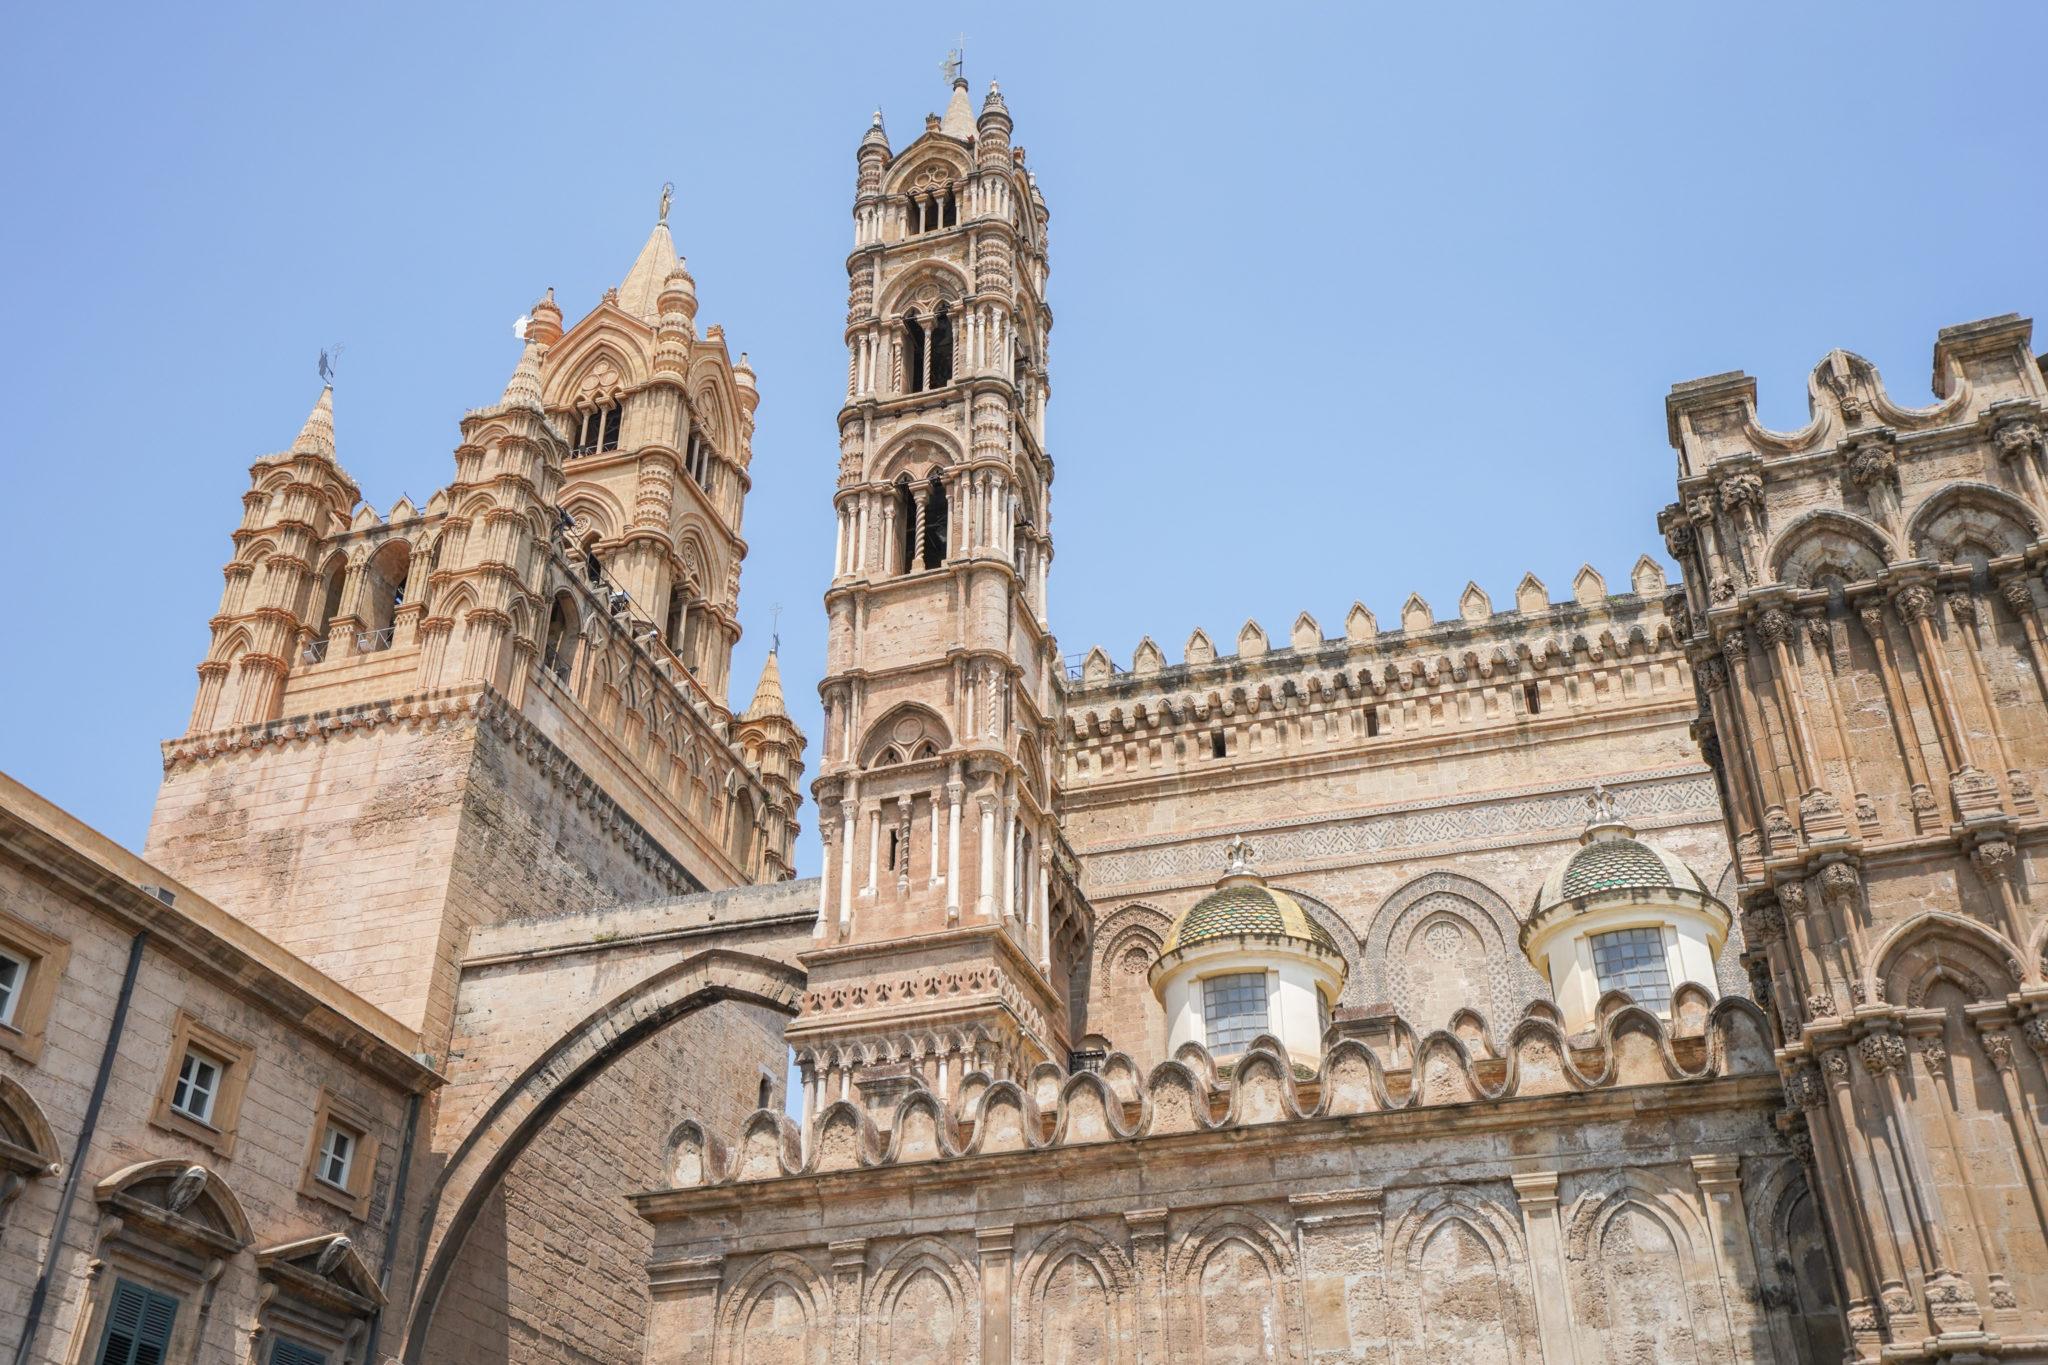 cathedrale-palerme-sicile-italie